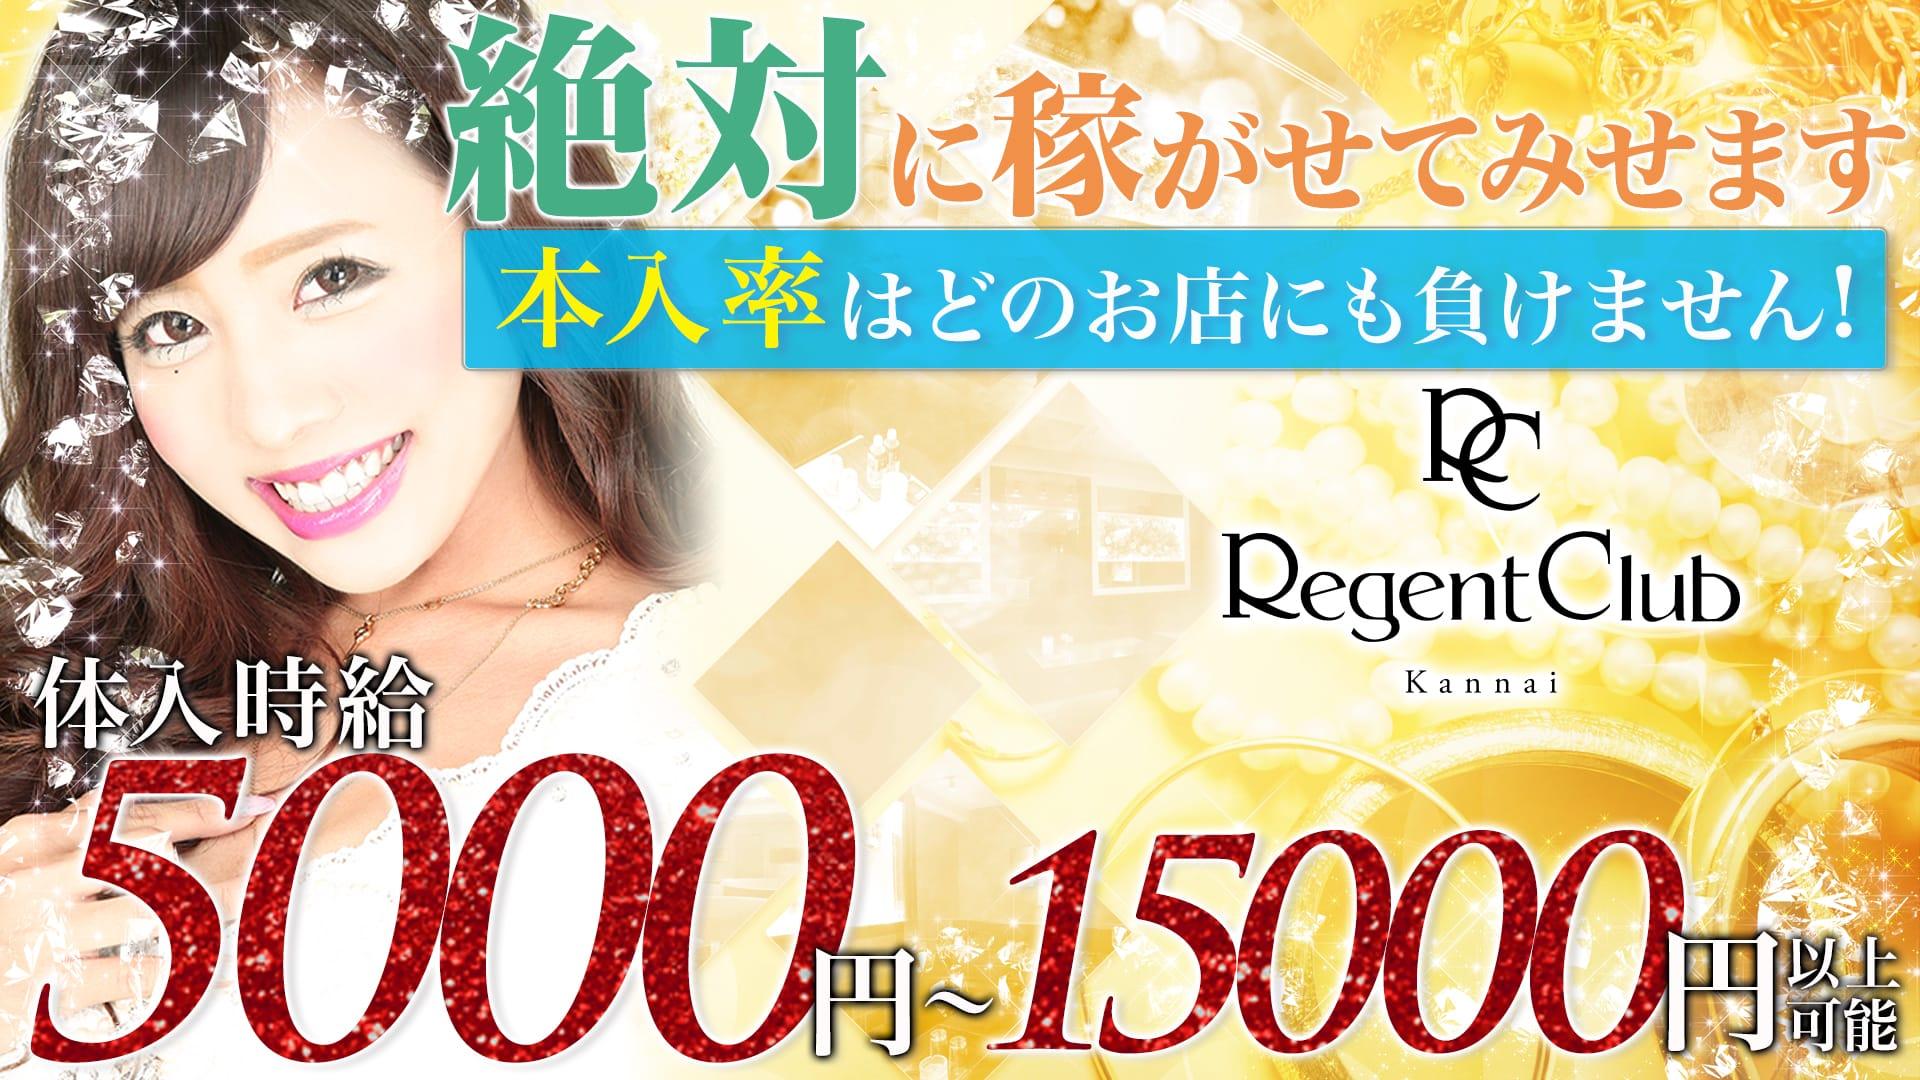 Regent Club Kannai[リージェントクラブ] 関内 キャバクラ TOP画像